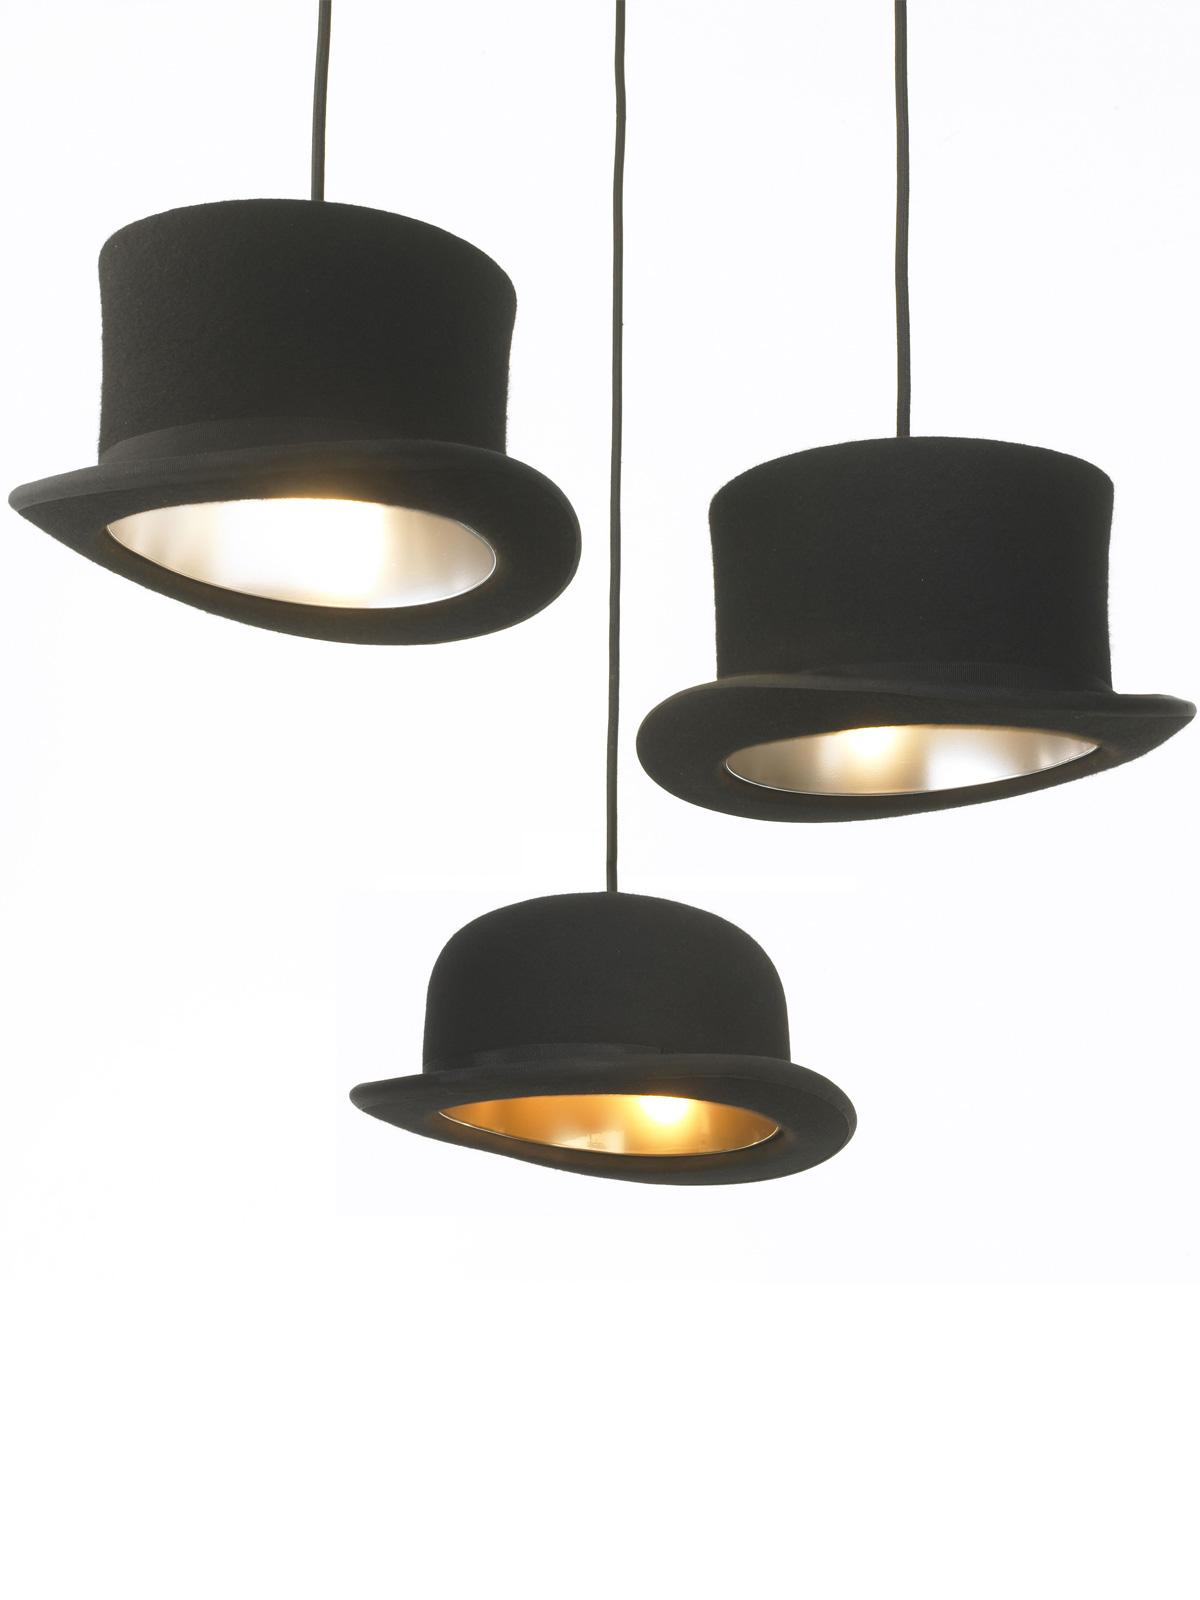 Jeeves & Wooster Pendelleuchten Hutlampen Innermost